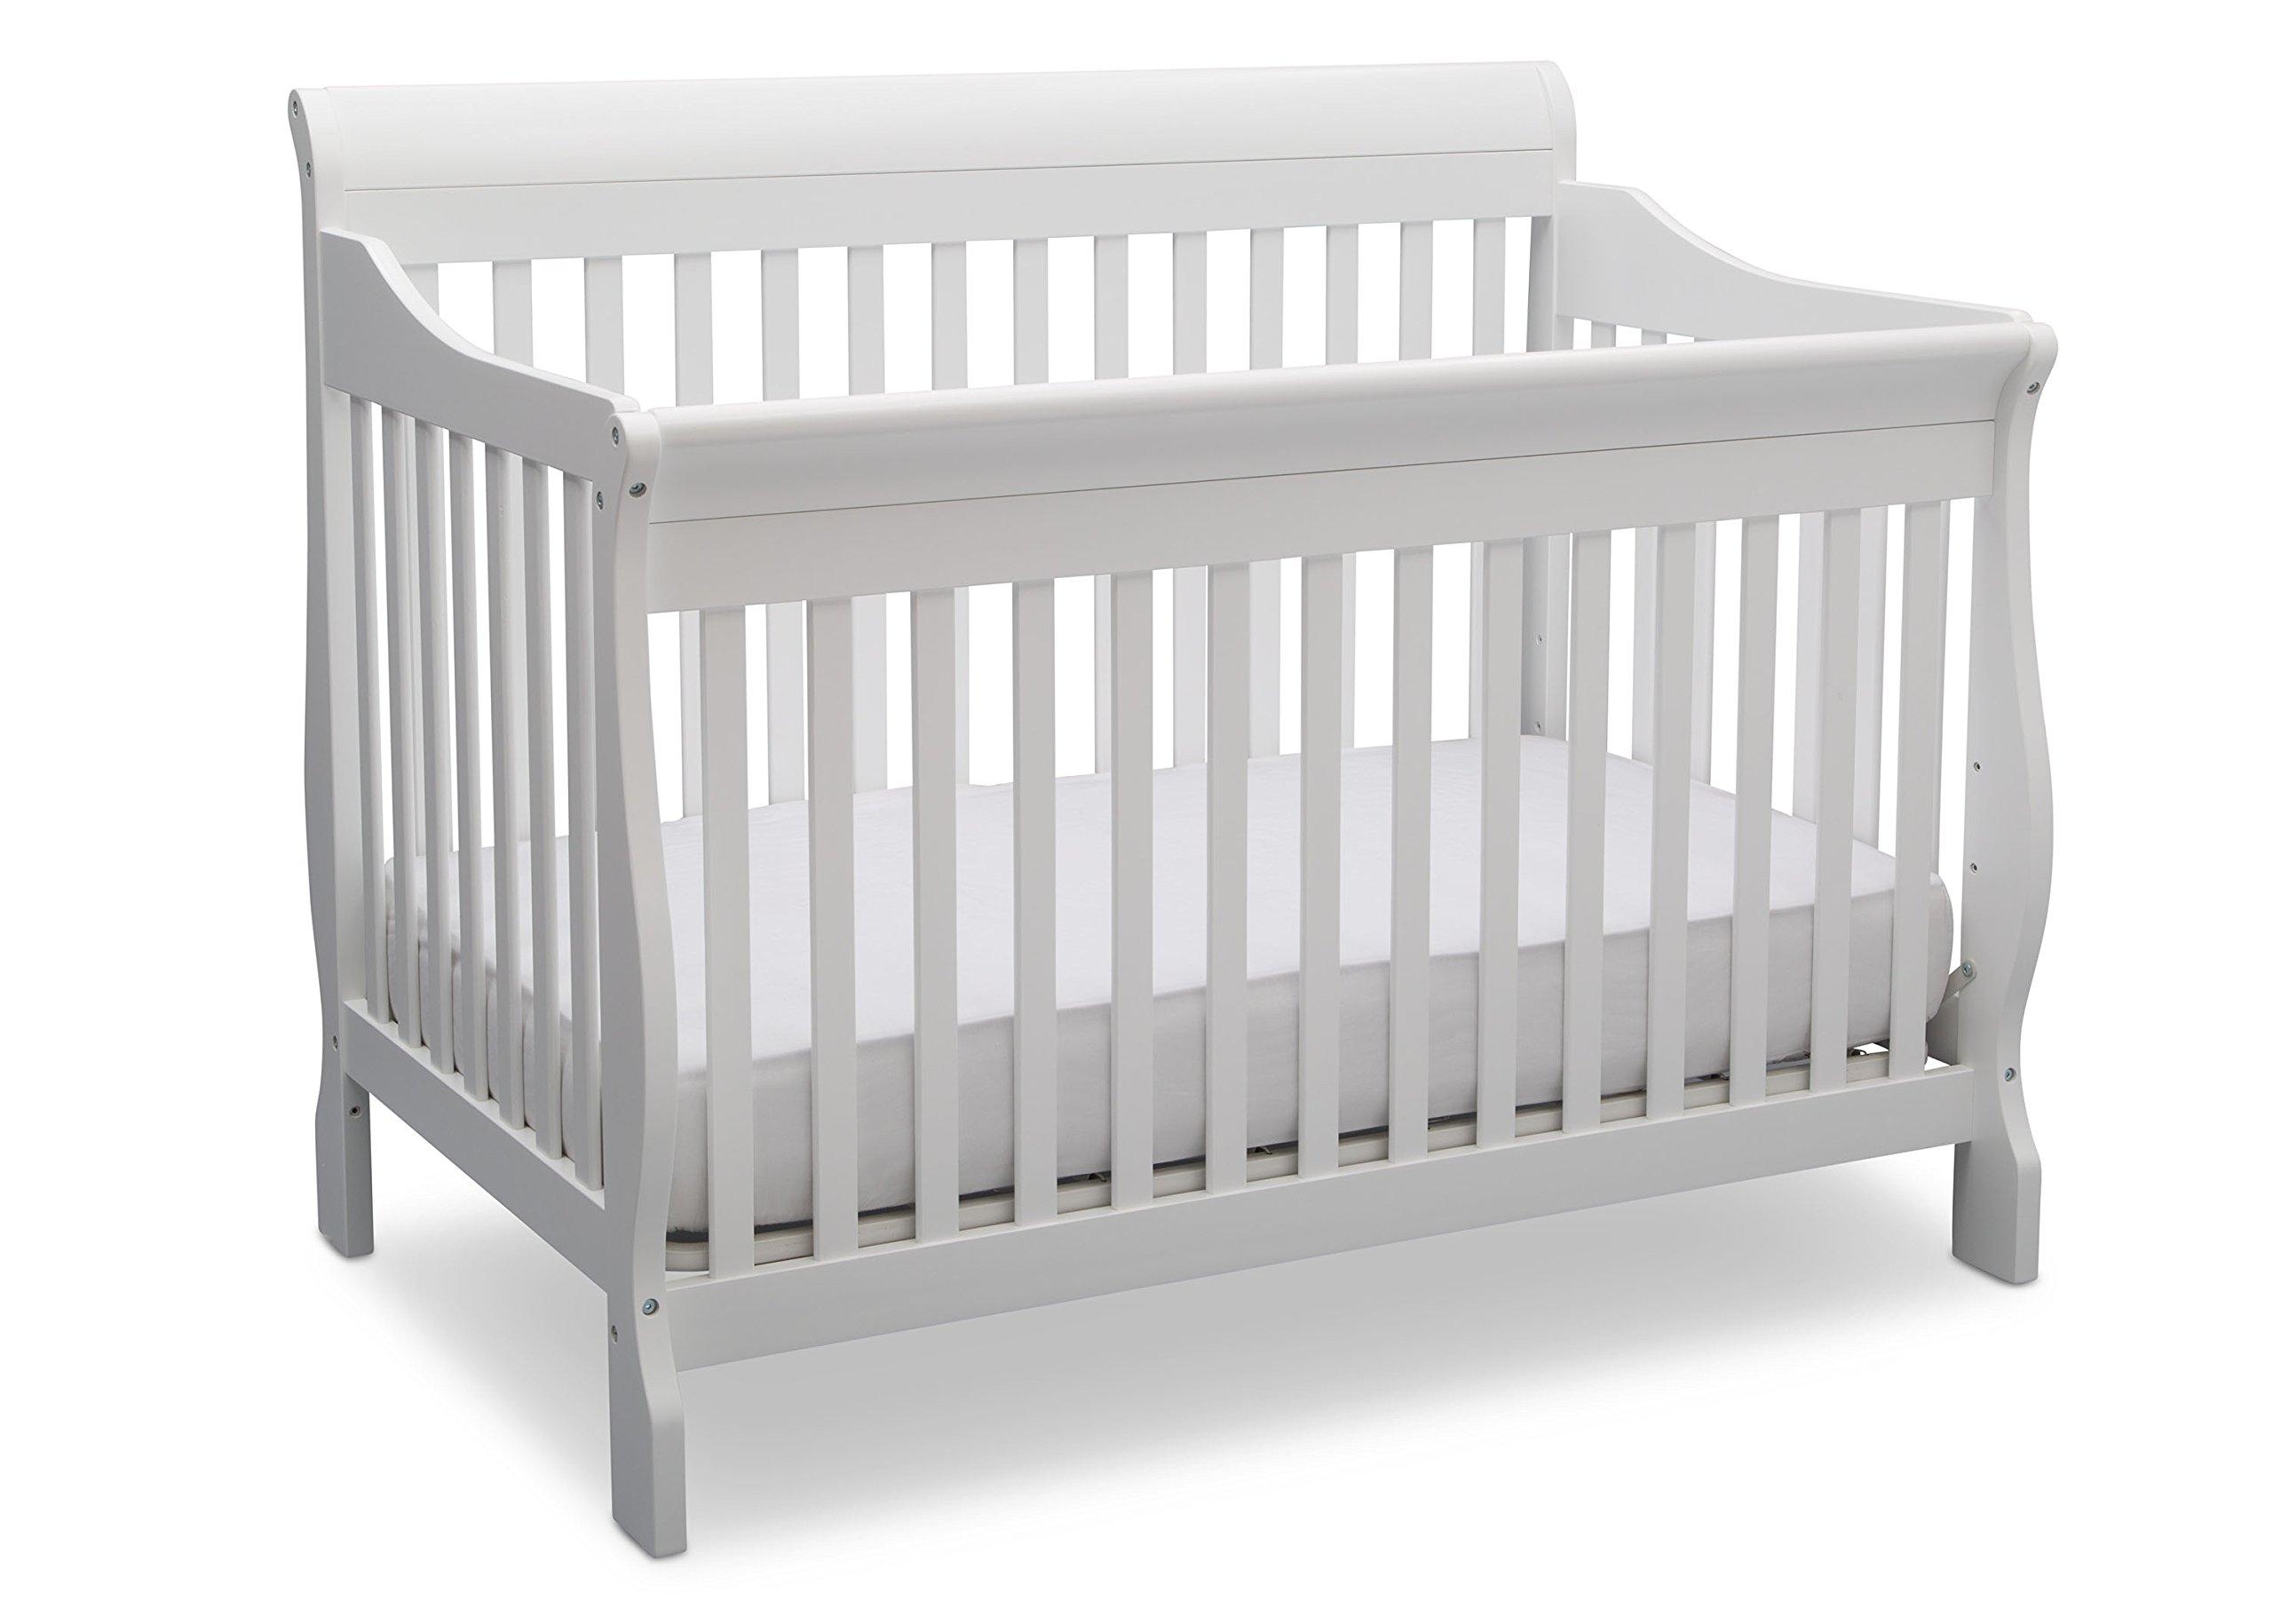 Delta Children Canton 4- in-1 Convertible Crib, Bianca,White